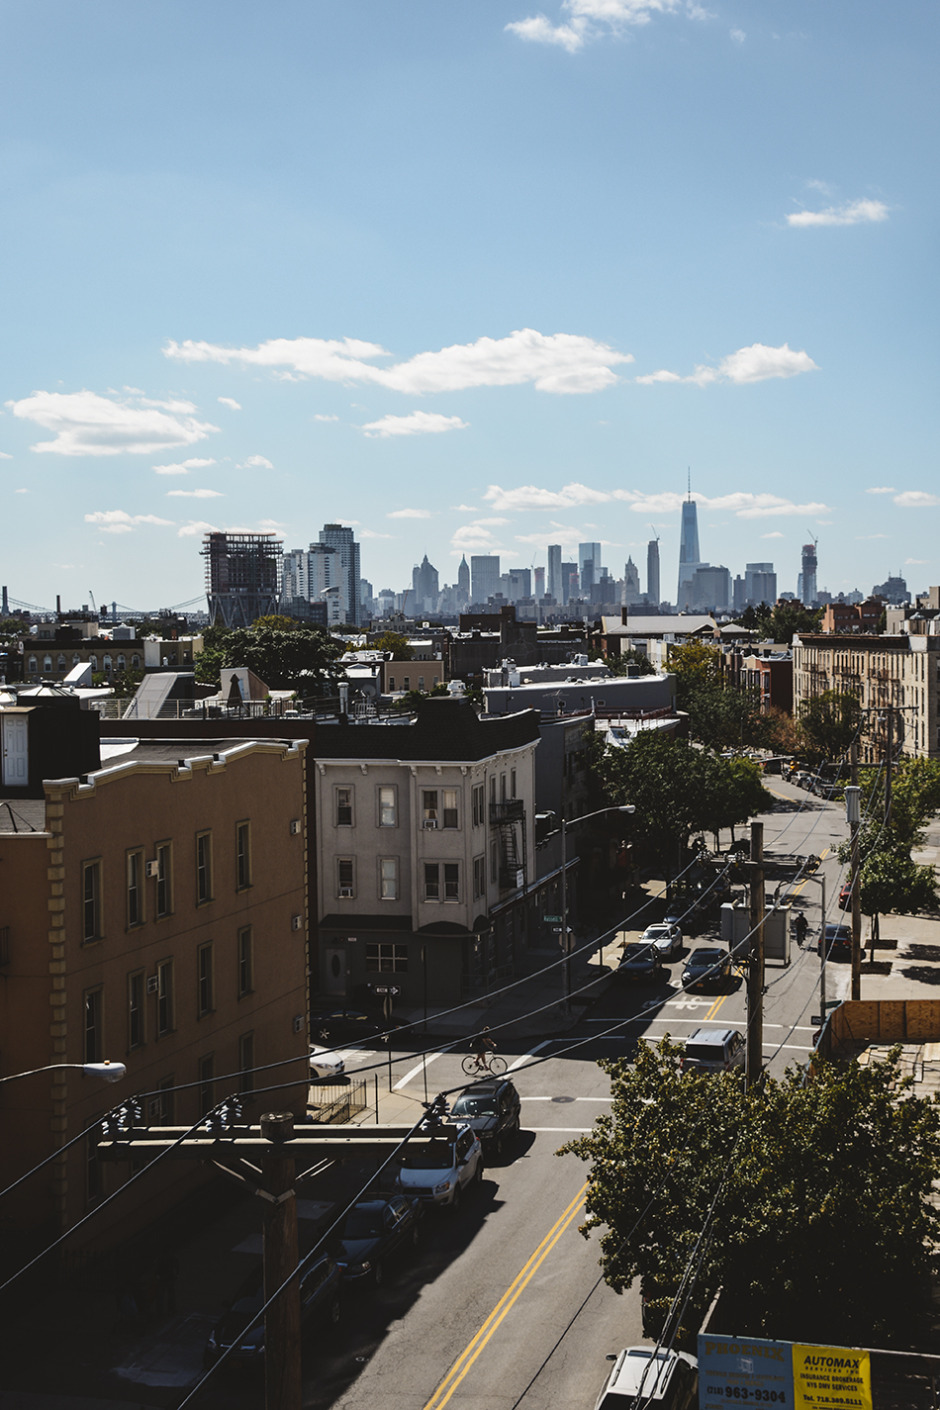 green point, new york, brooklyn, nice pierce, i am galla, new york travel guide